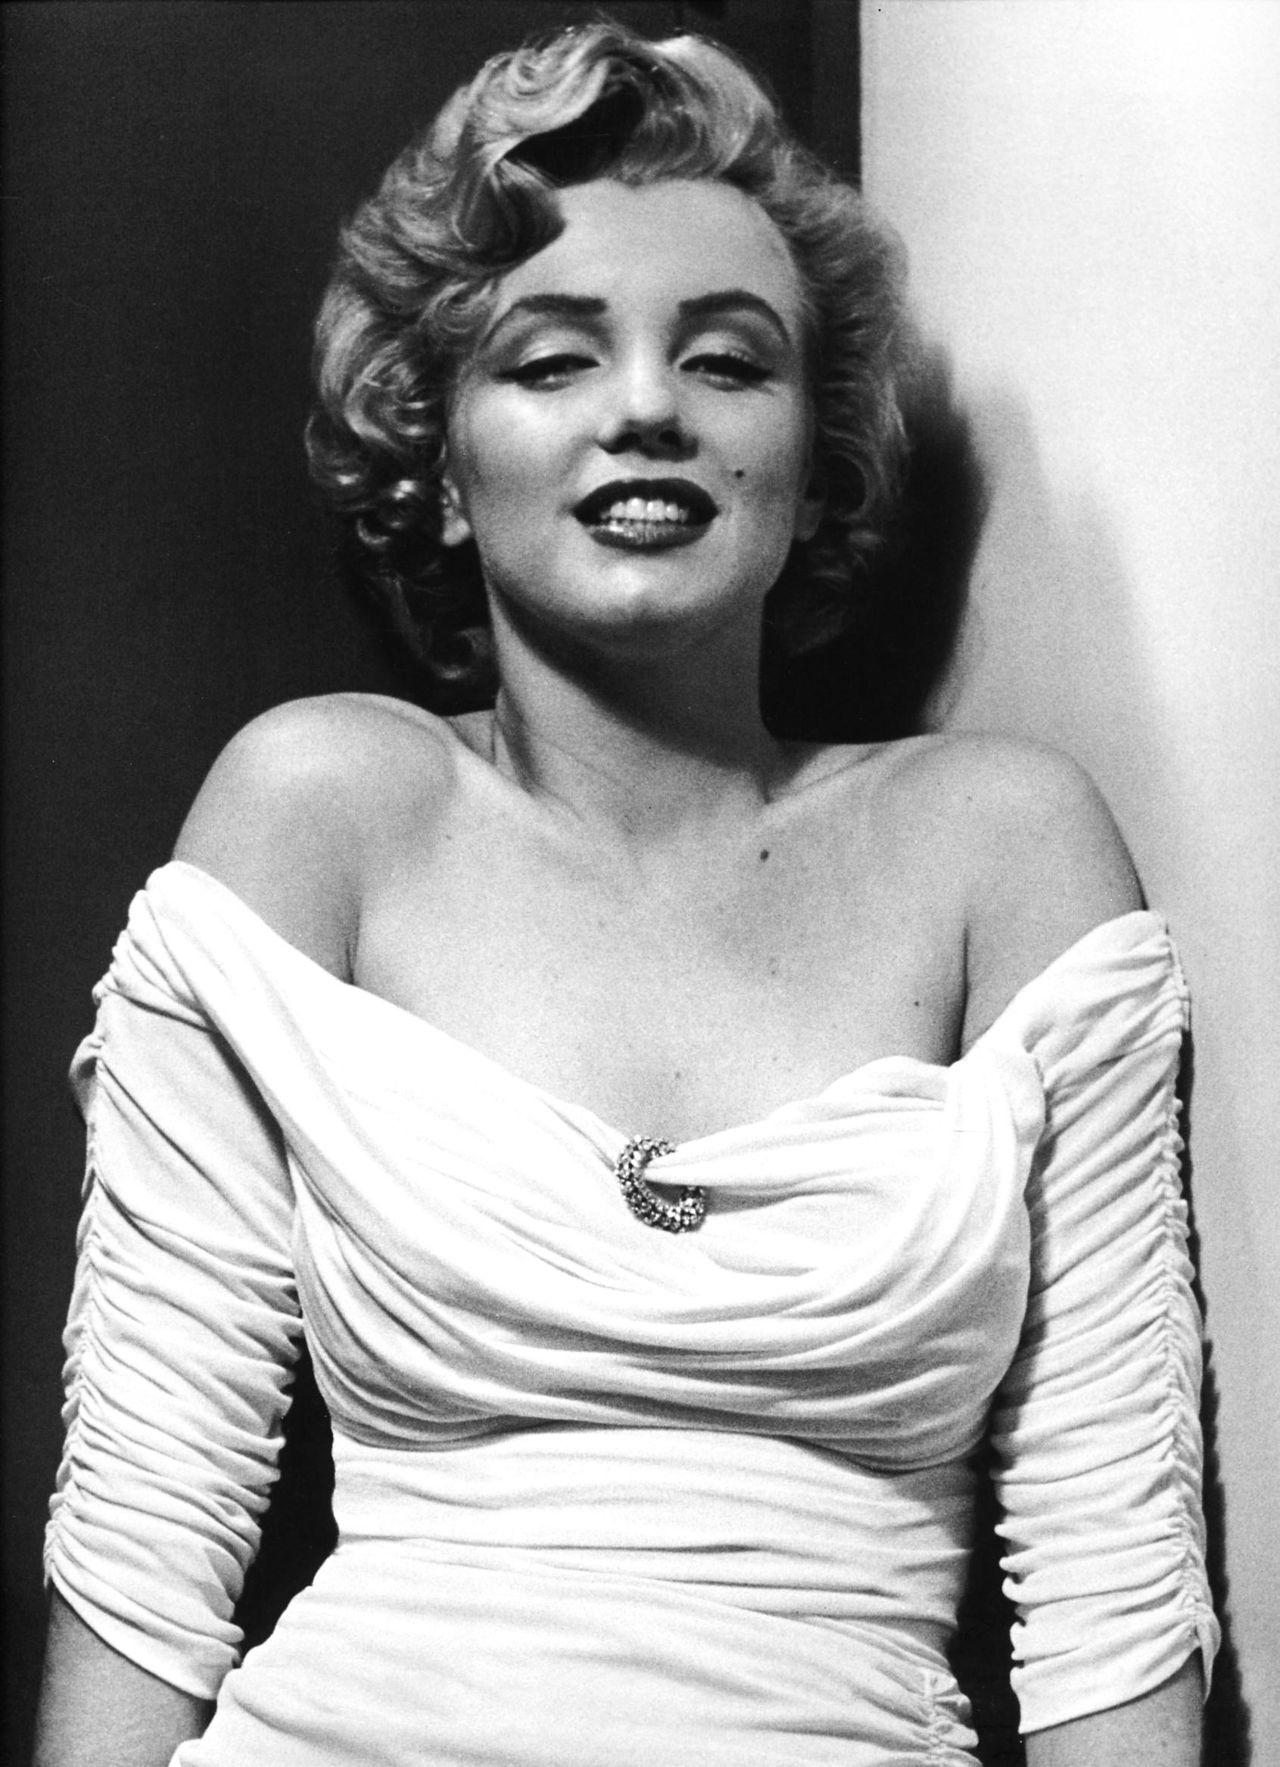 Marilyn Monroe Portrait by Philippe Halsman